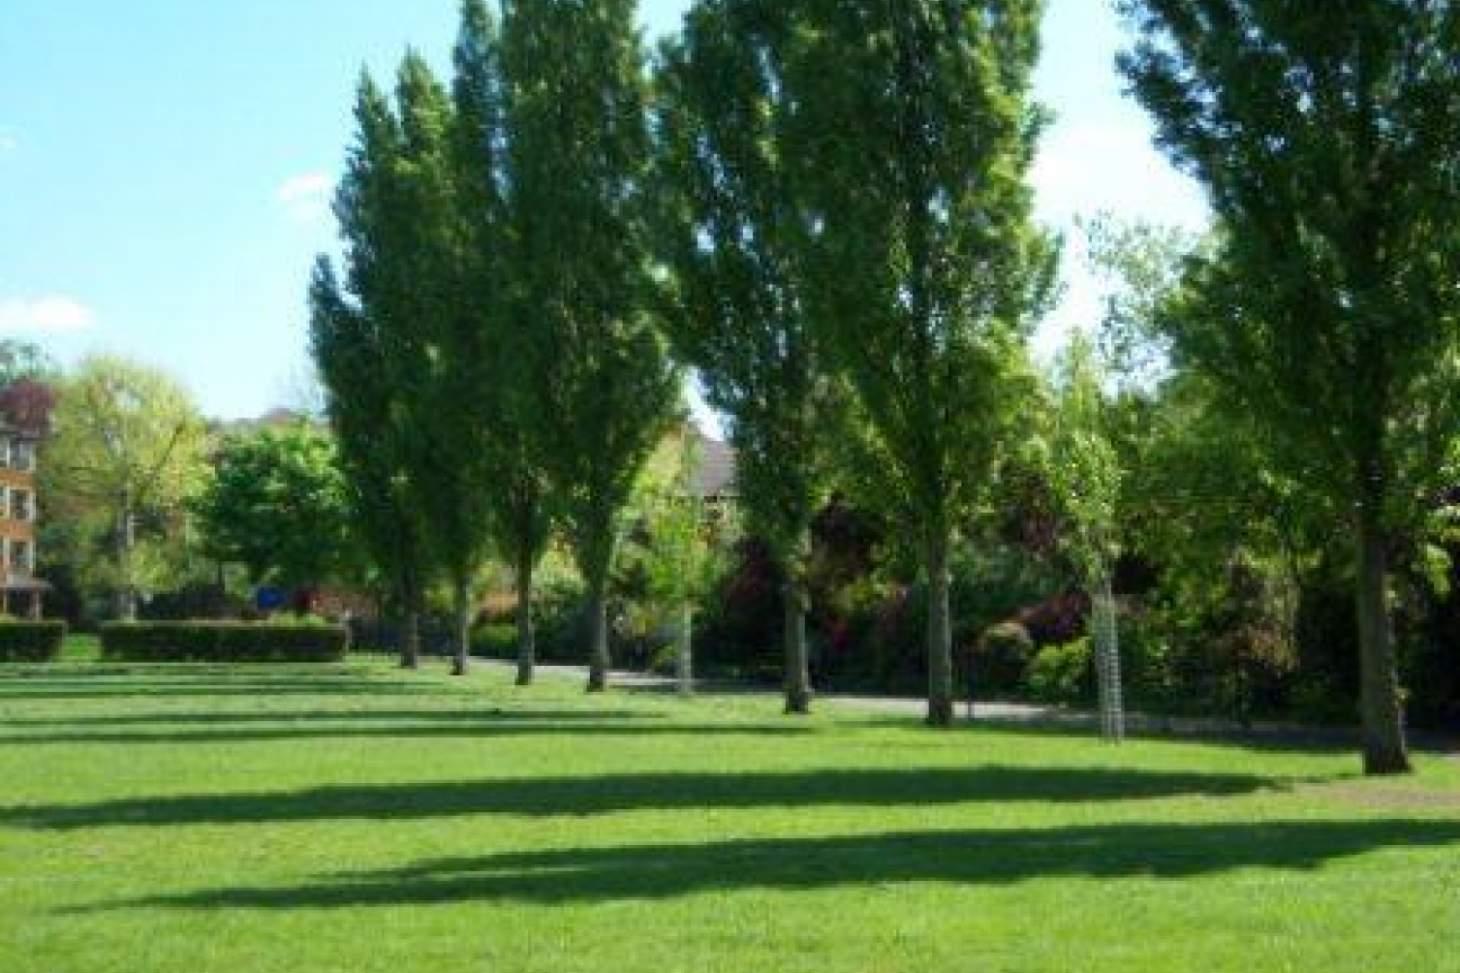 Kensington Memorial Park Outdoor | Hard (macadam) tennis court